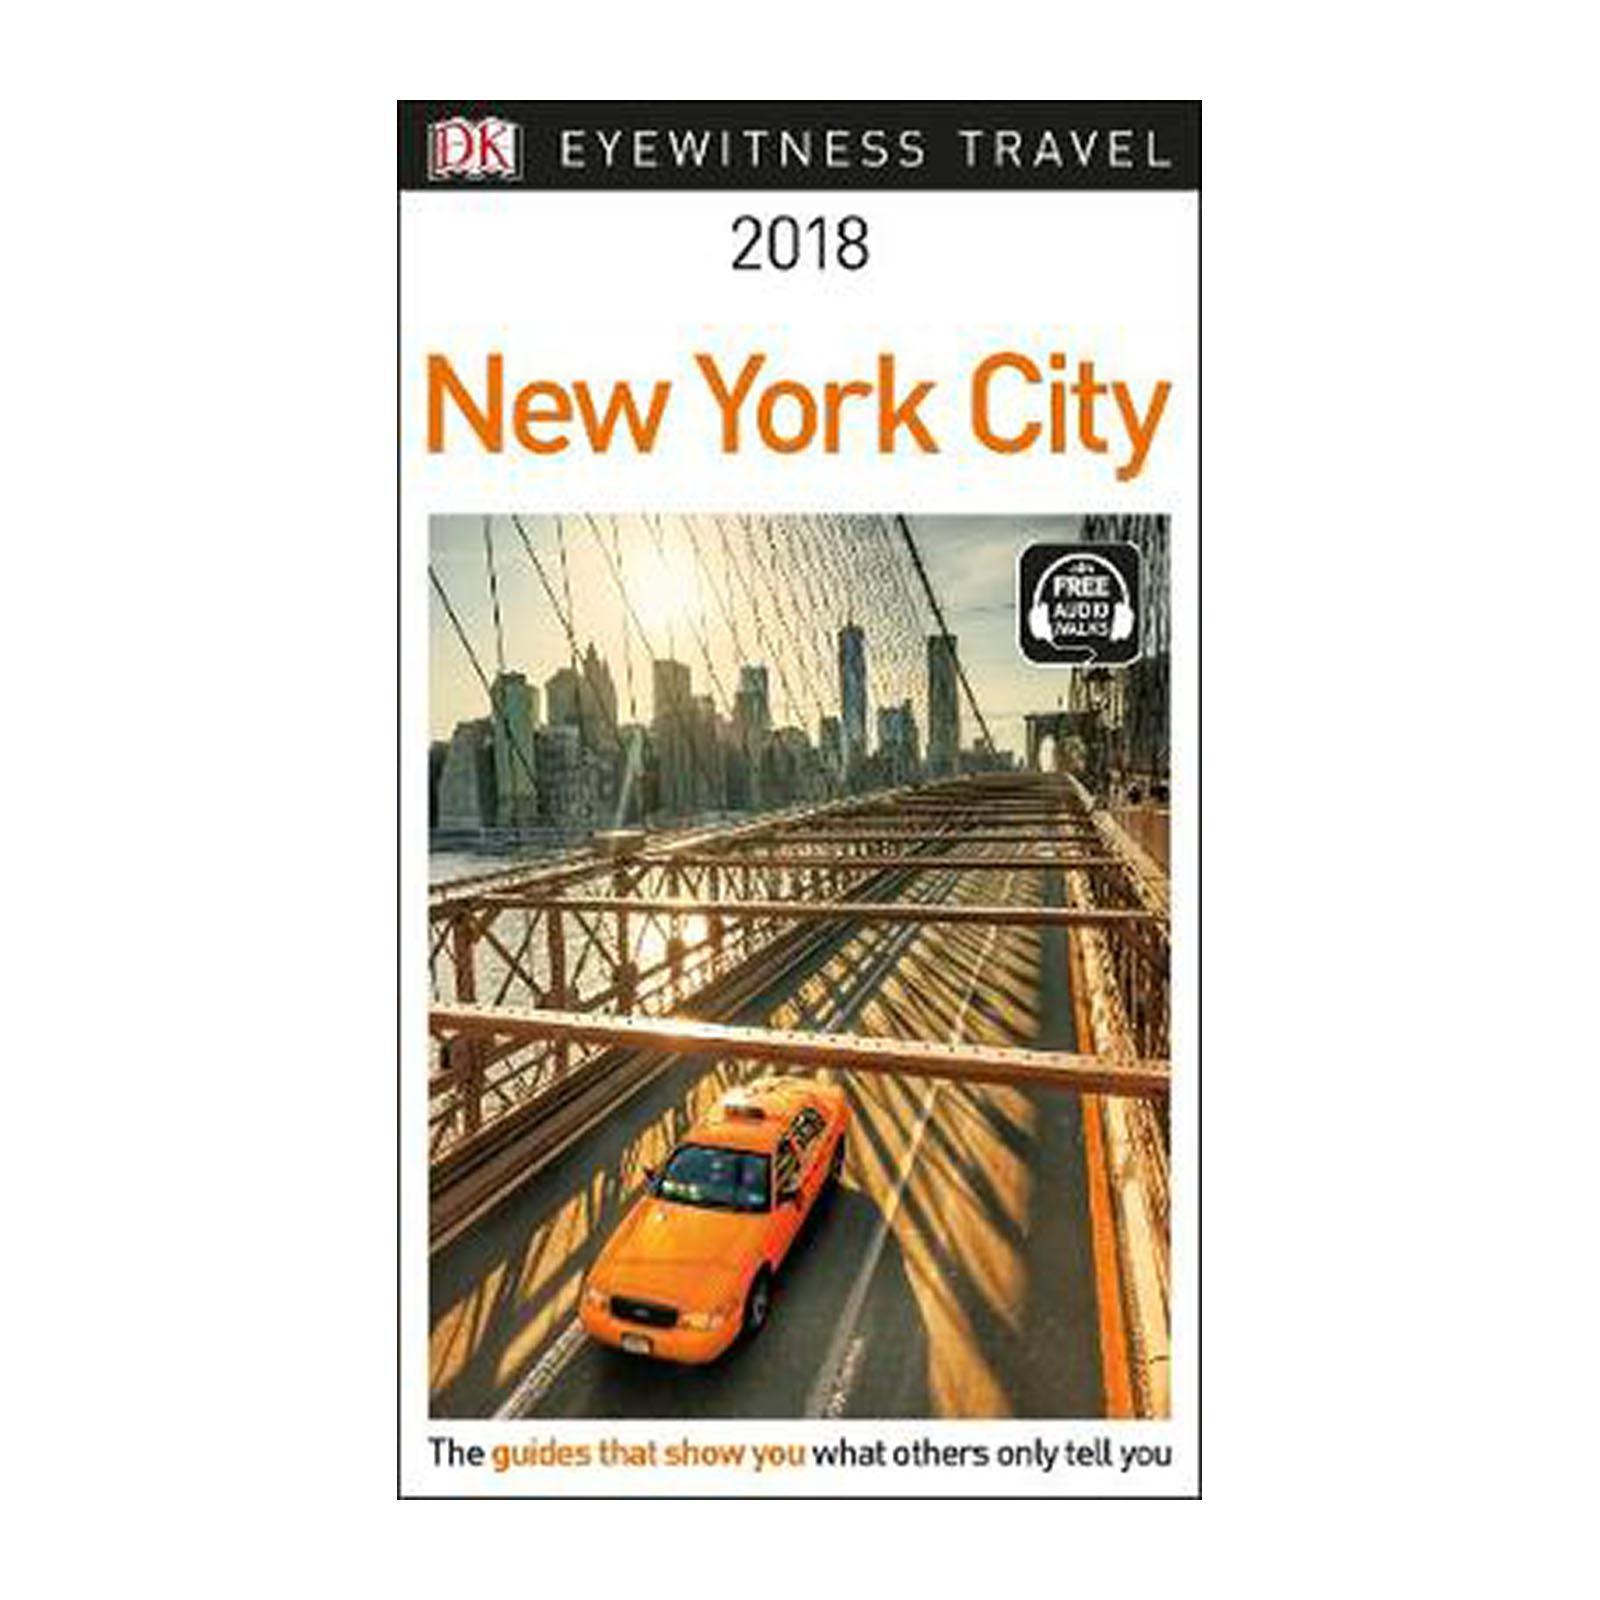 Dk Eyewitness Travel Guide New York City: 2018 (Paperback)